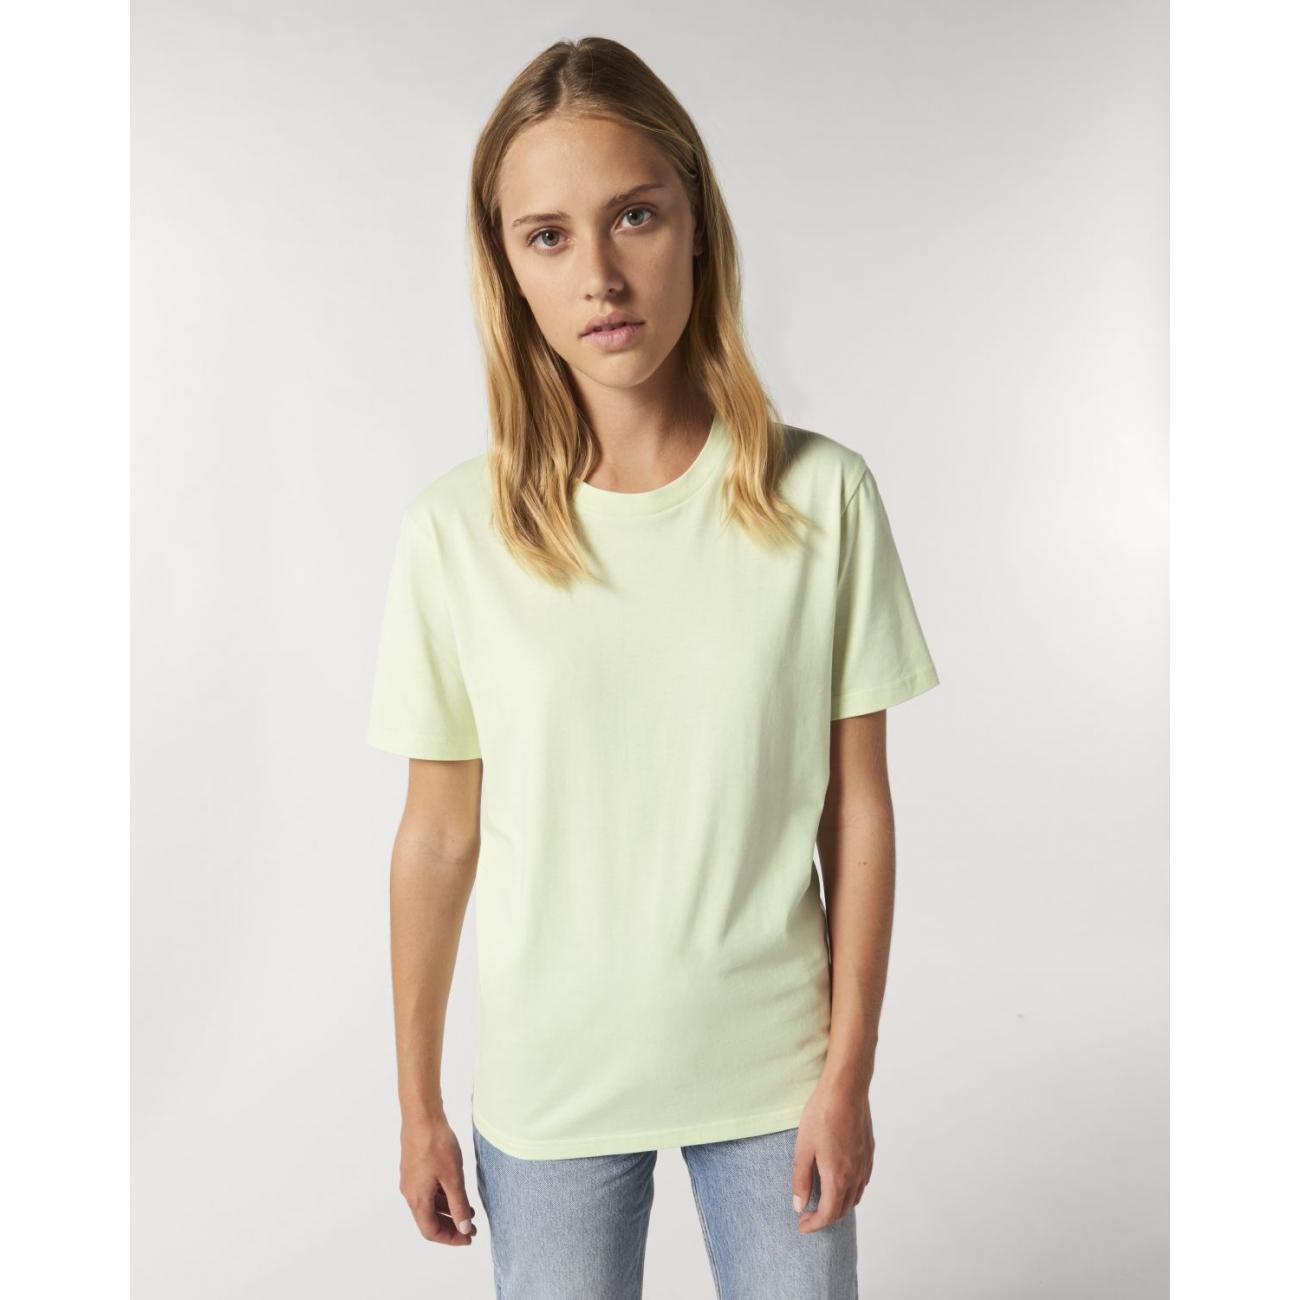 https://tee-shirt-bio.com/10677-thickbox_default/tee-shirt-femme-coton-bio-col-rond-coupe-classique-vert-pastel-.jpg